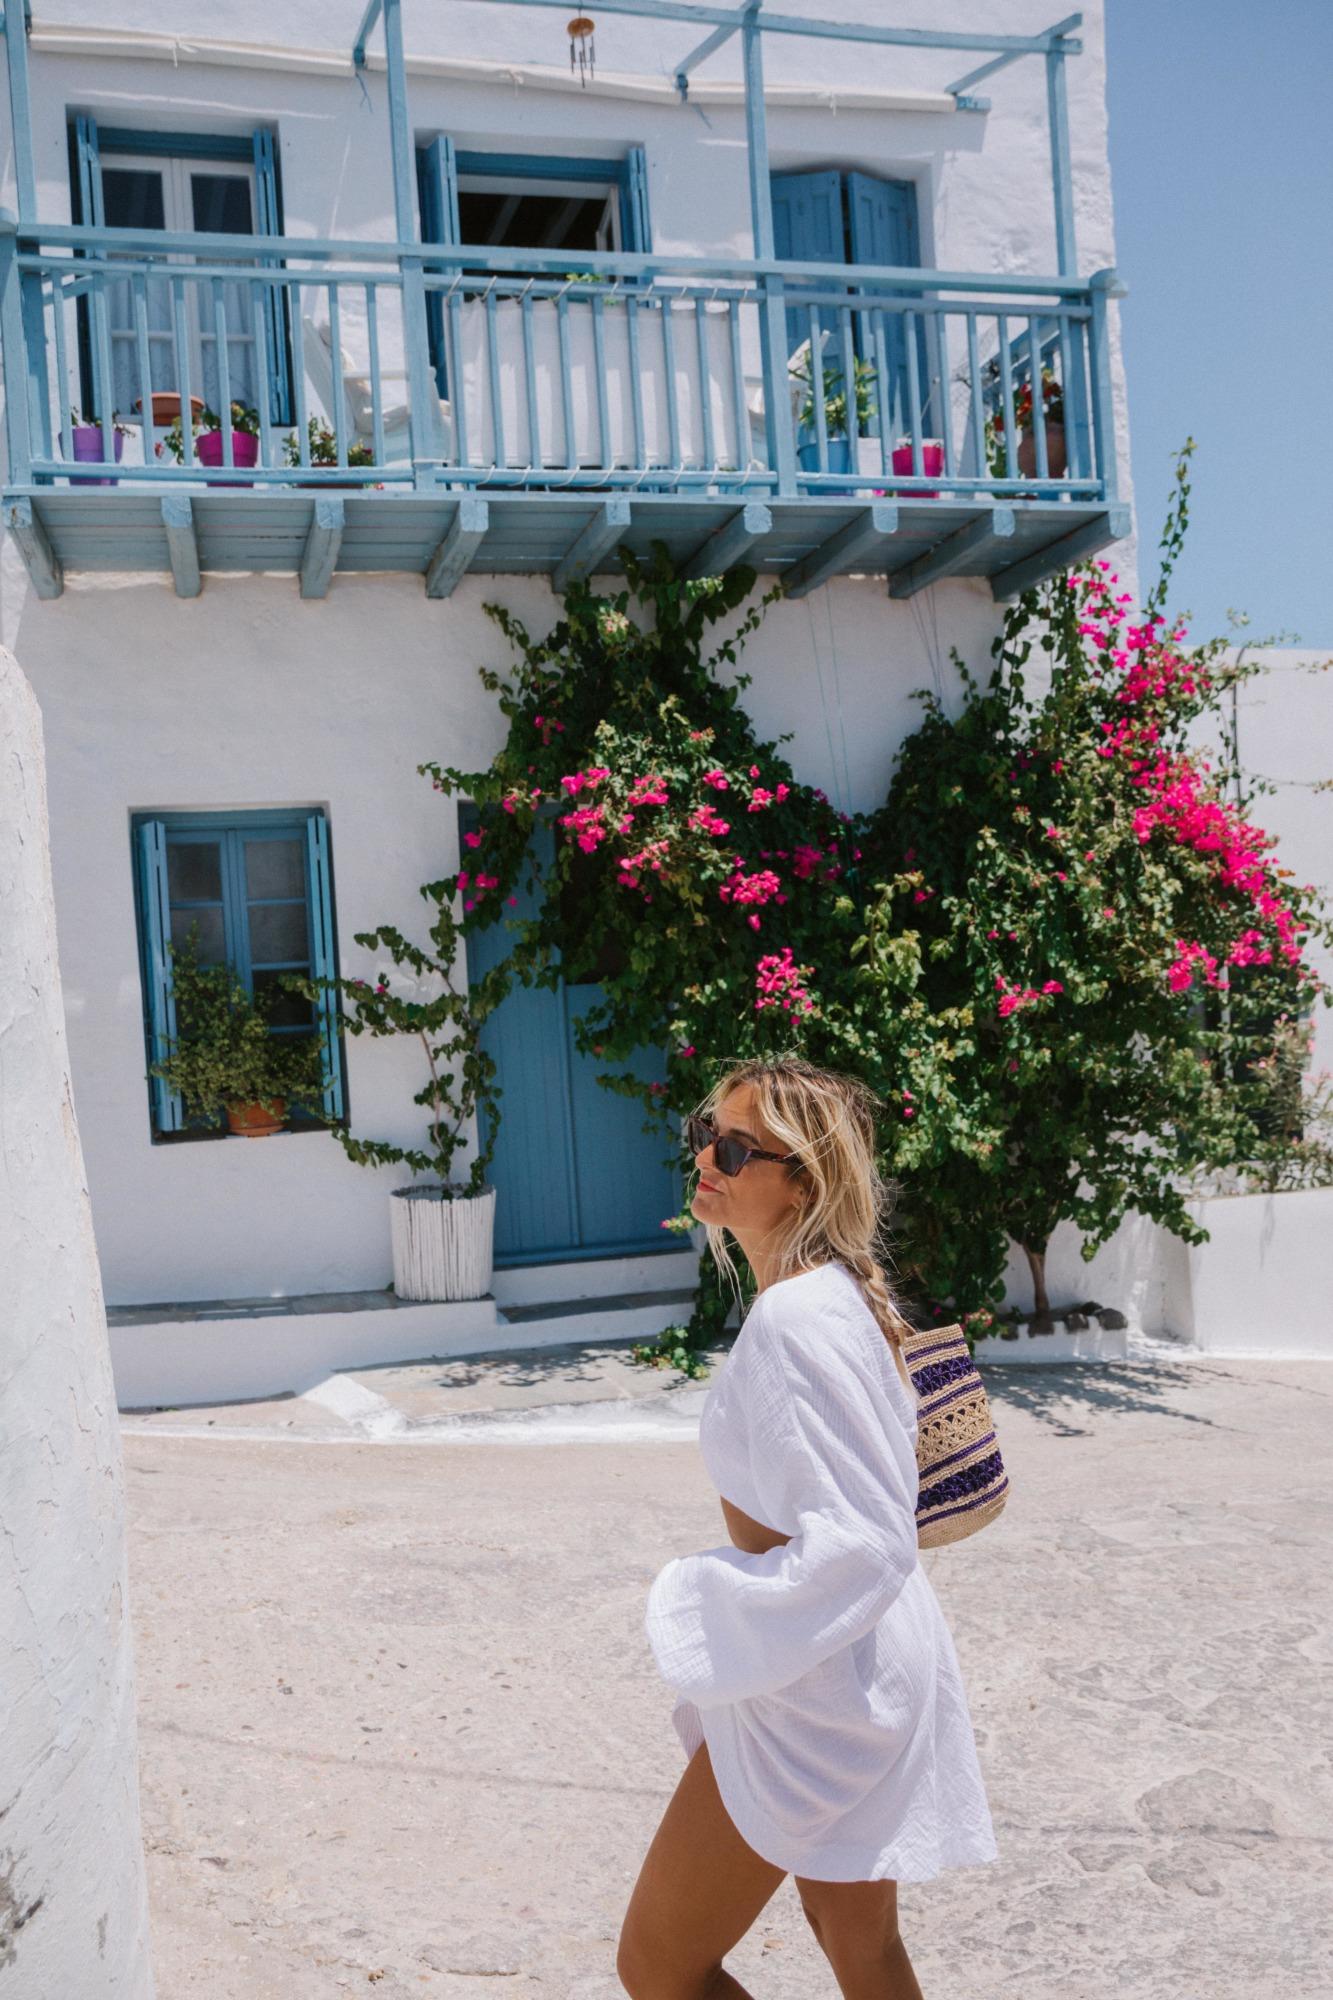 Plaka Milos Grèce - Blondie Baby blog voyage